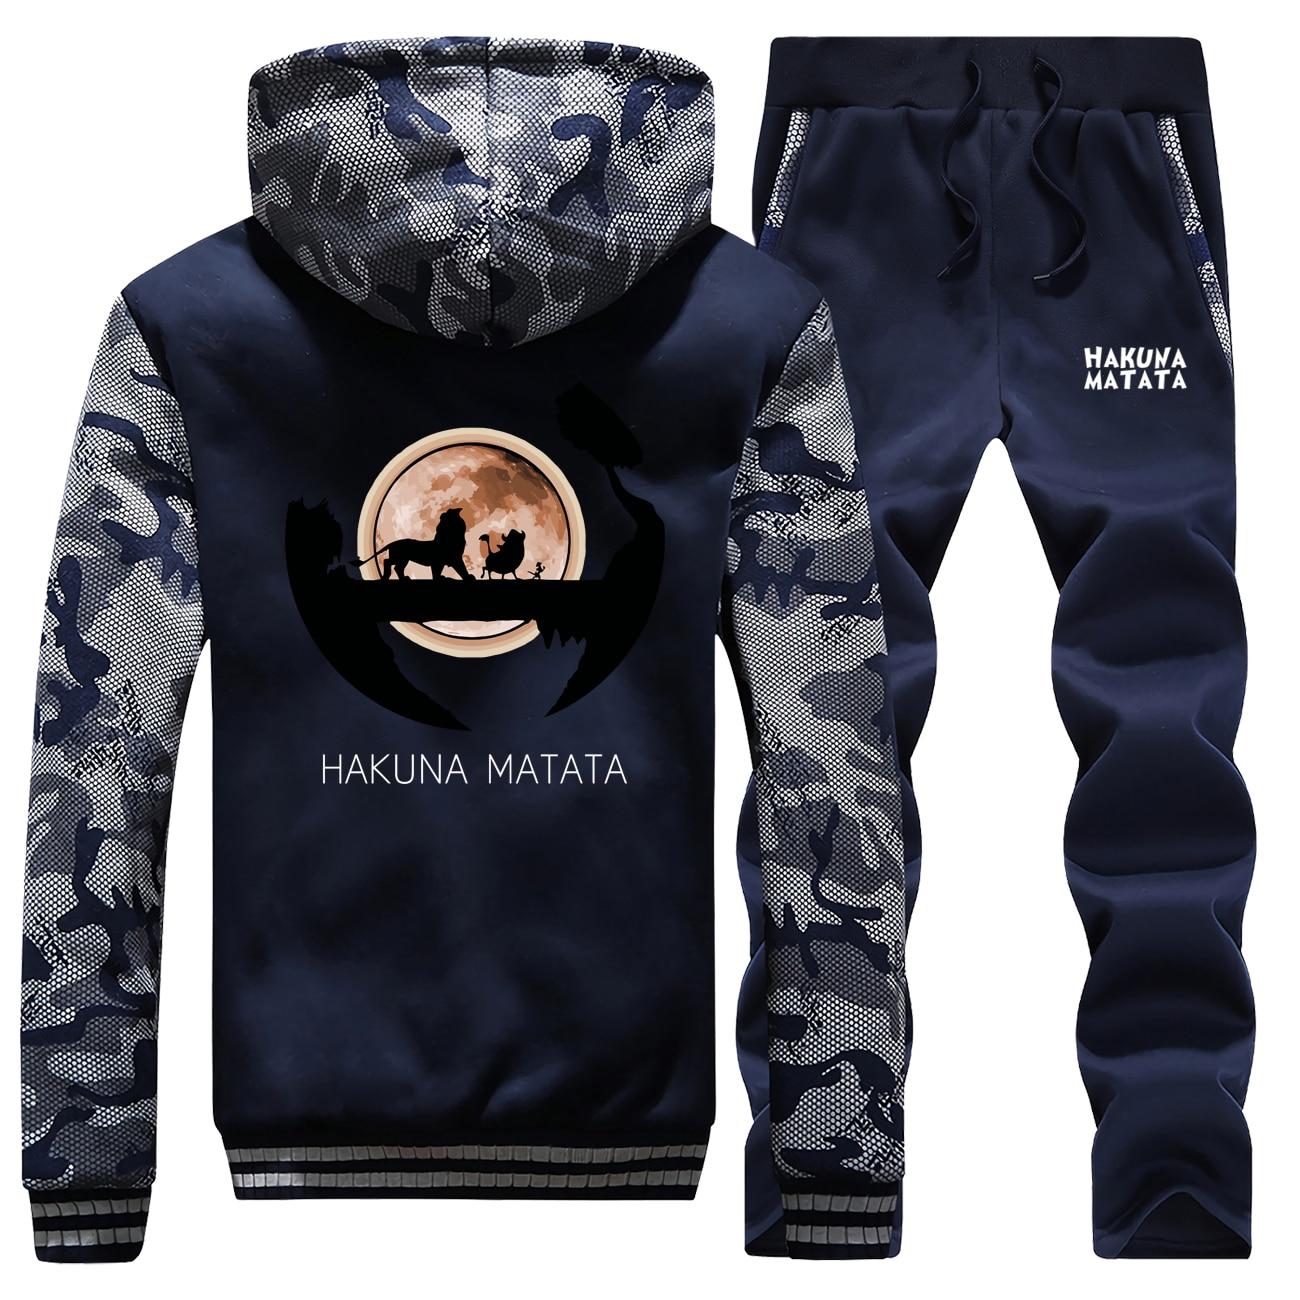 New Winter Sweatshirts Men Raglan Camouflage Hoodie Simba The Lion King Suit Coat Thick Cartoon Hooded+Sweatpants 2 Piece Set